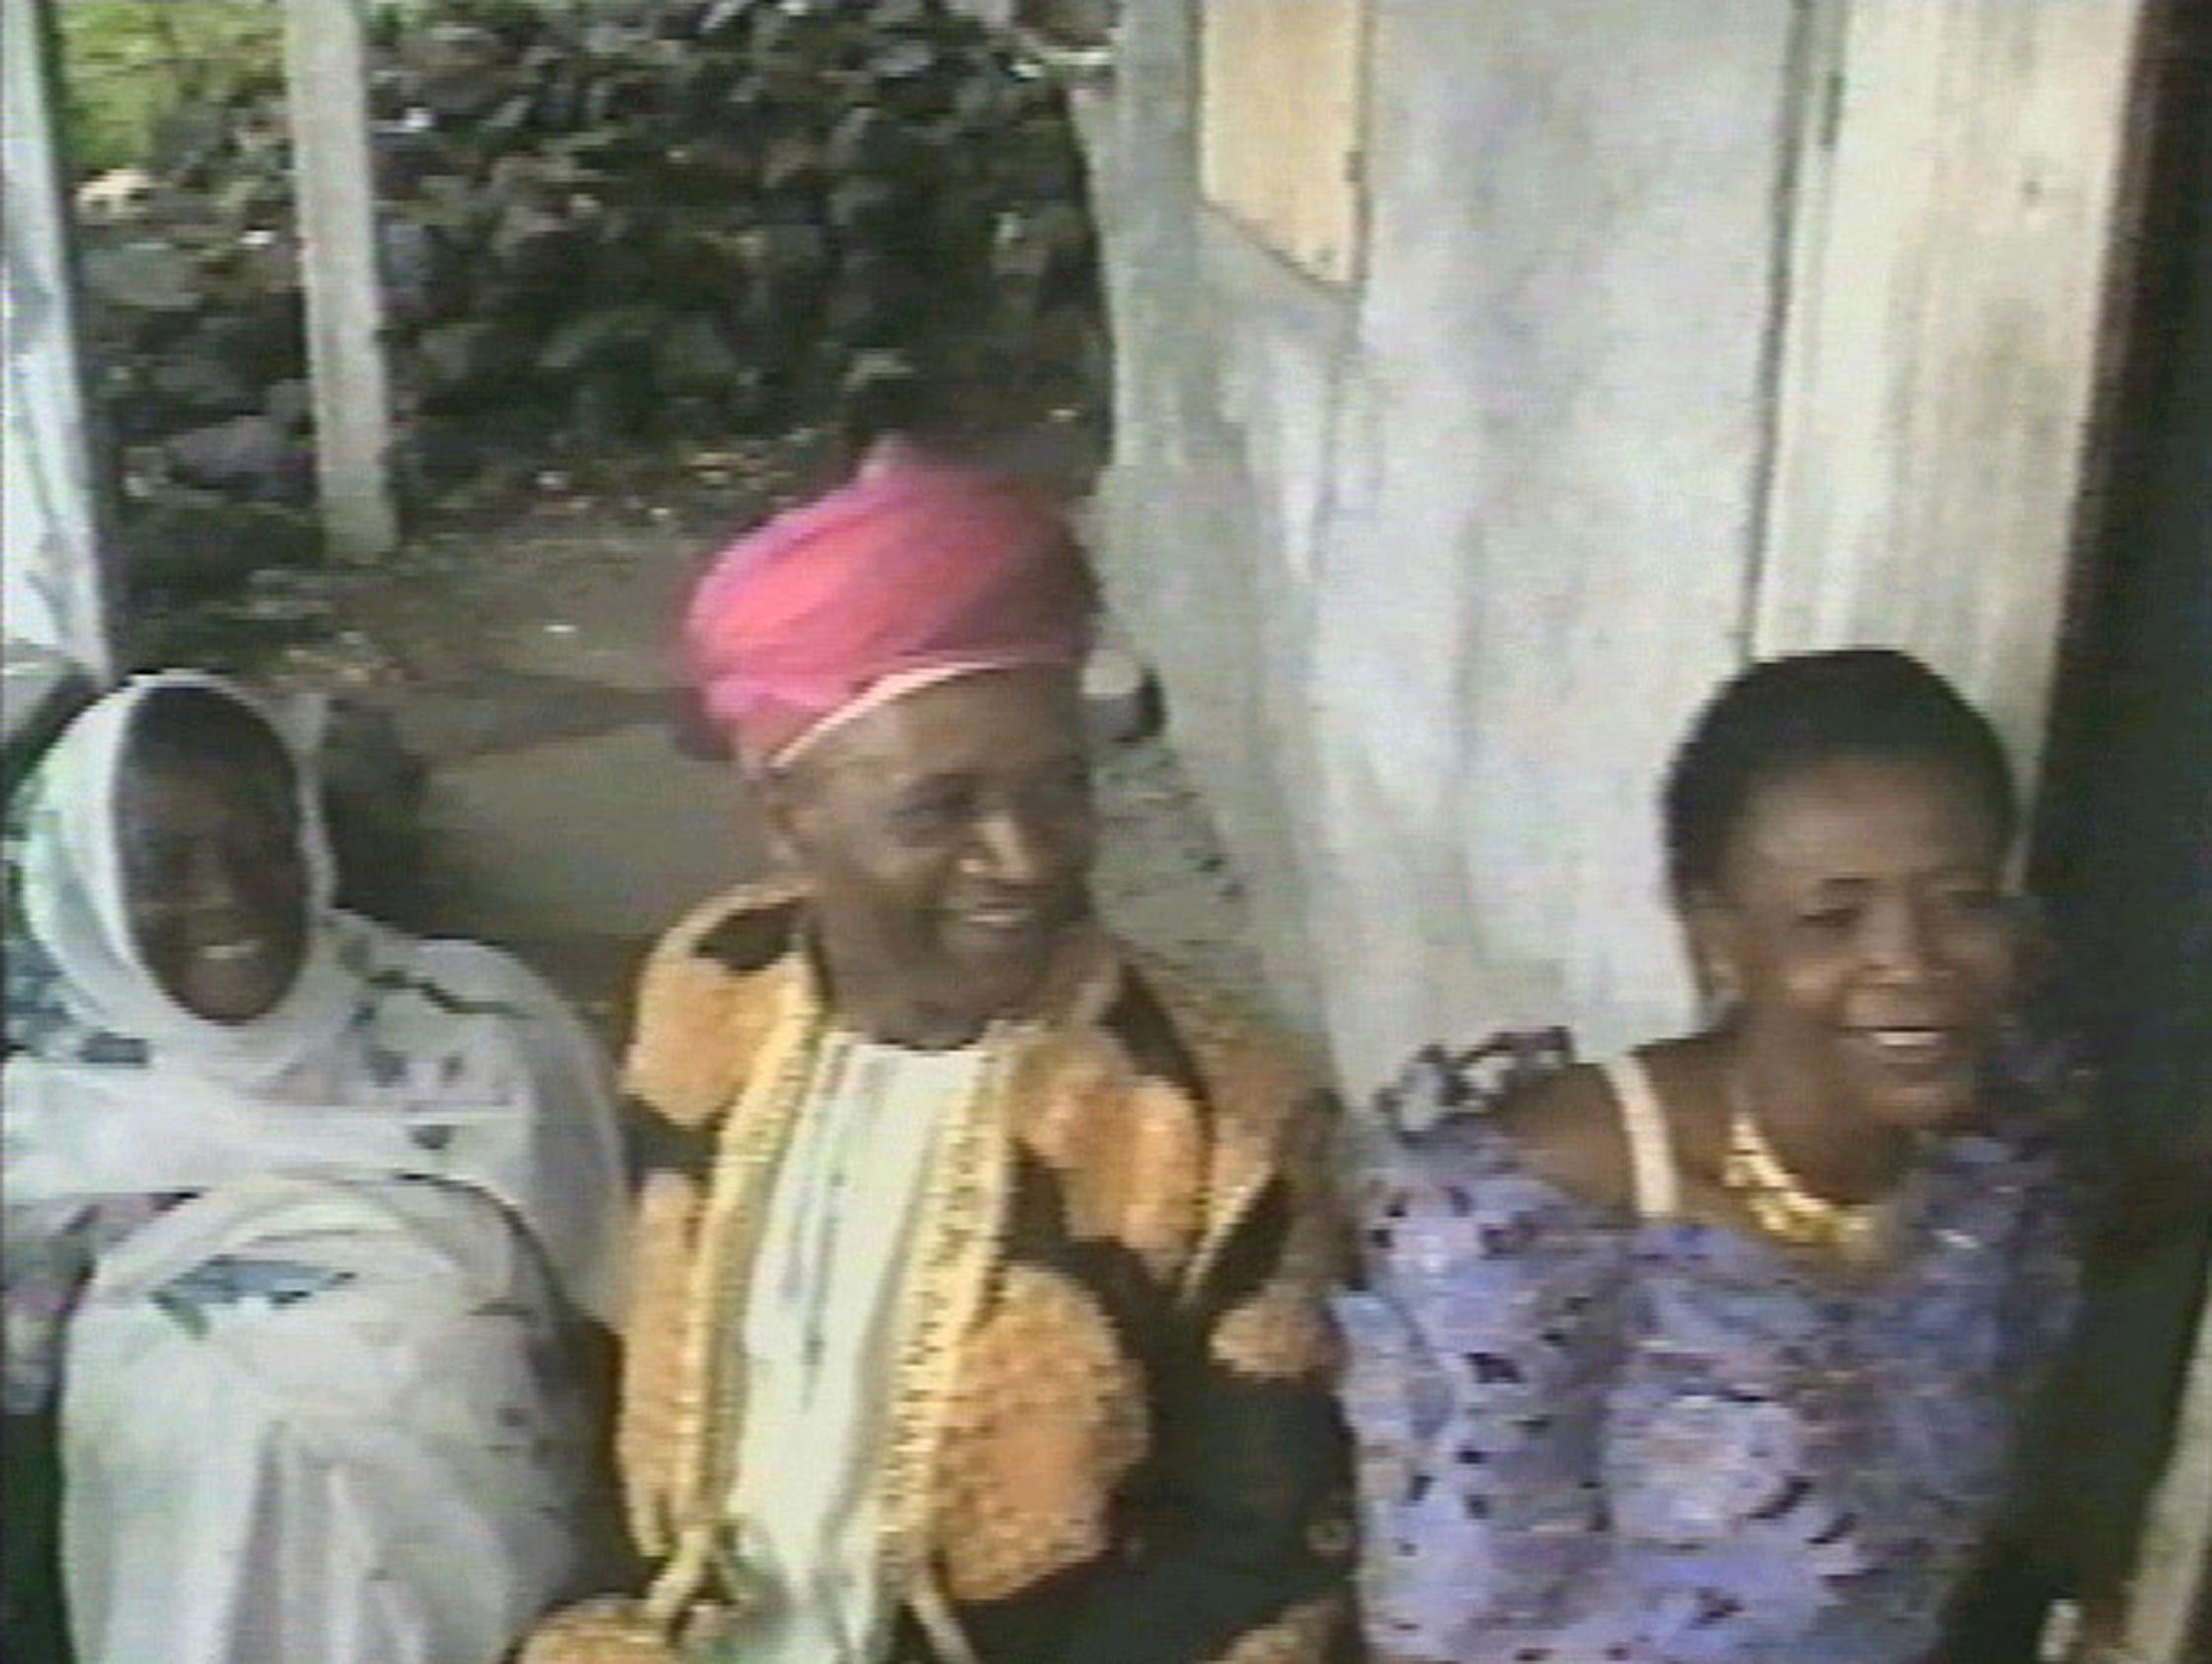 Gaëlle Vu, Mariata Abdallah - La maison de Mariata